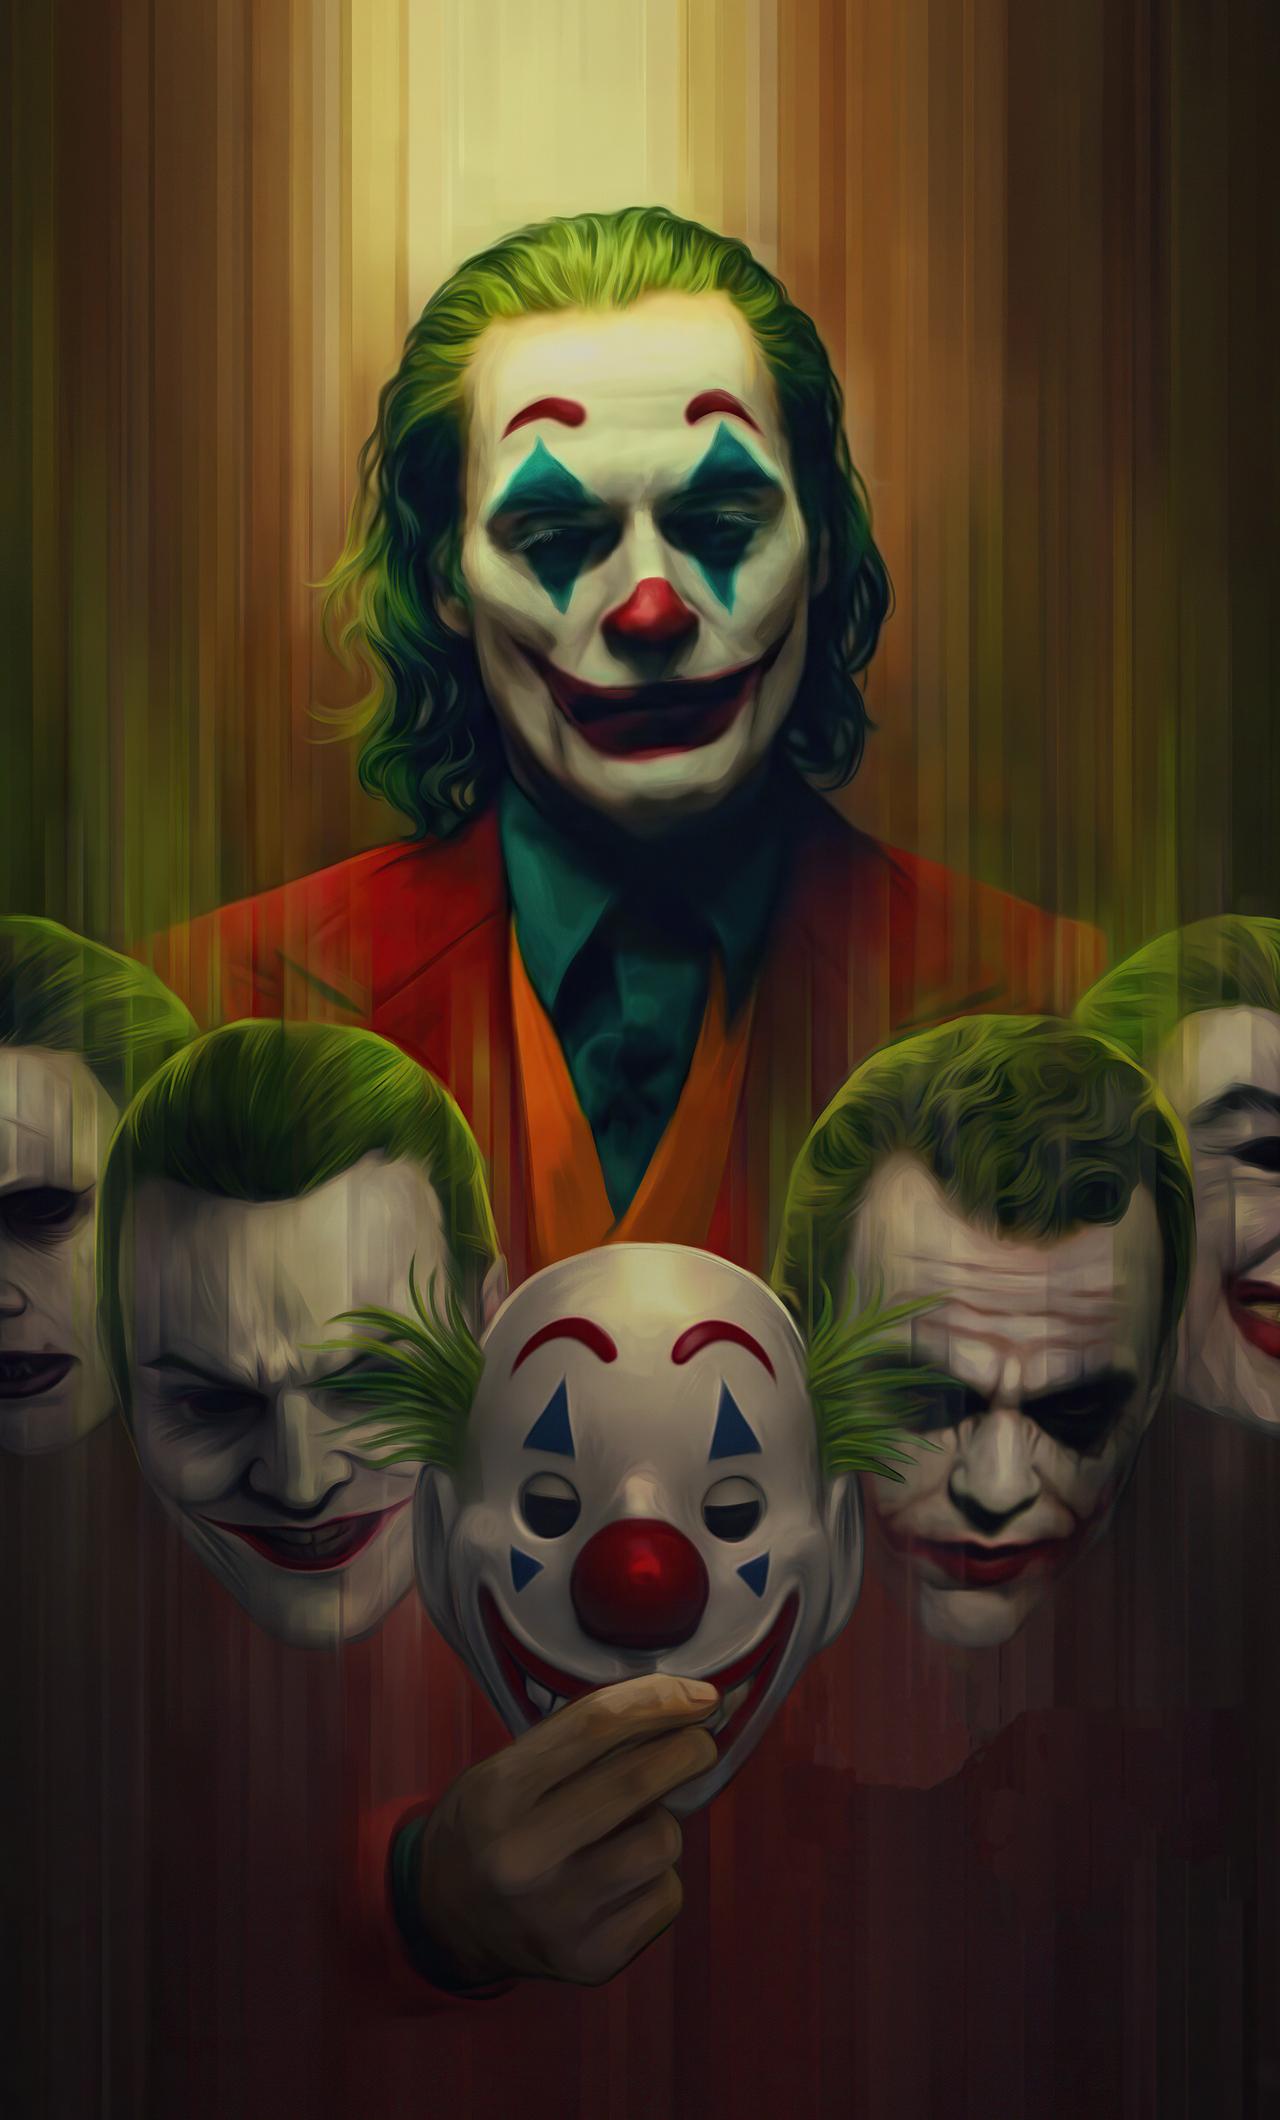 1280x2120 Joker Artwork 4k New iPhone 6+ HD 4k Wallpapers ...